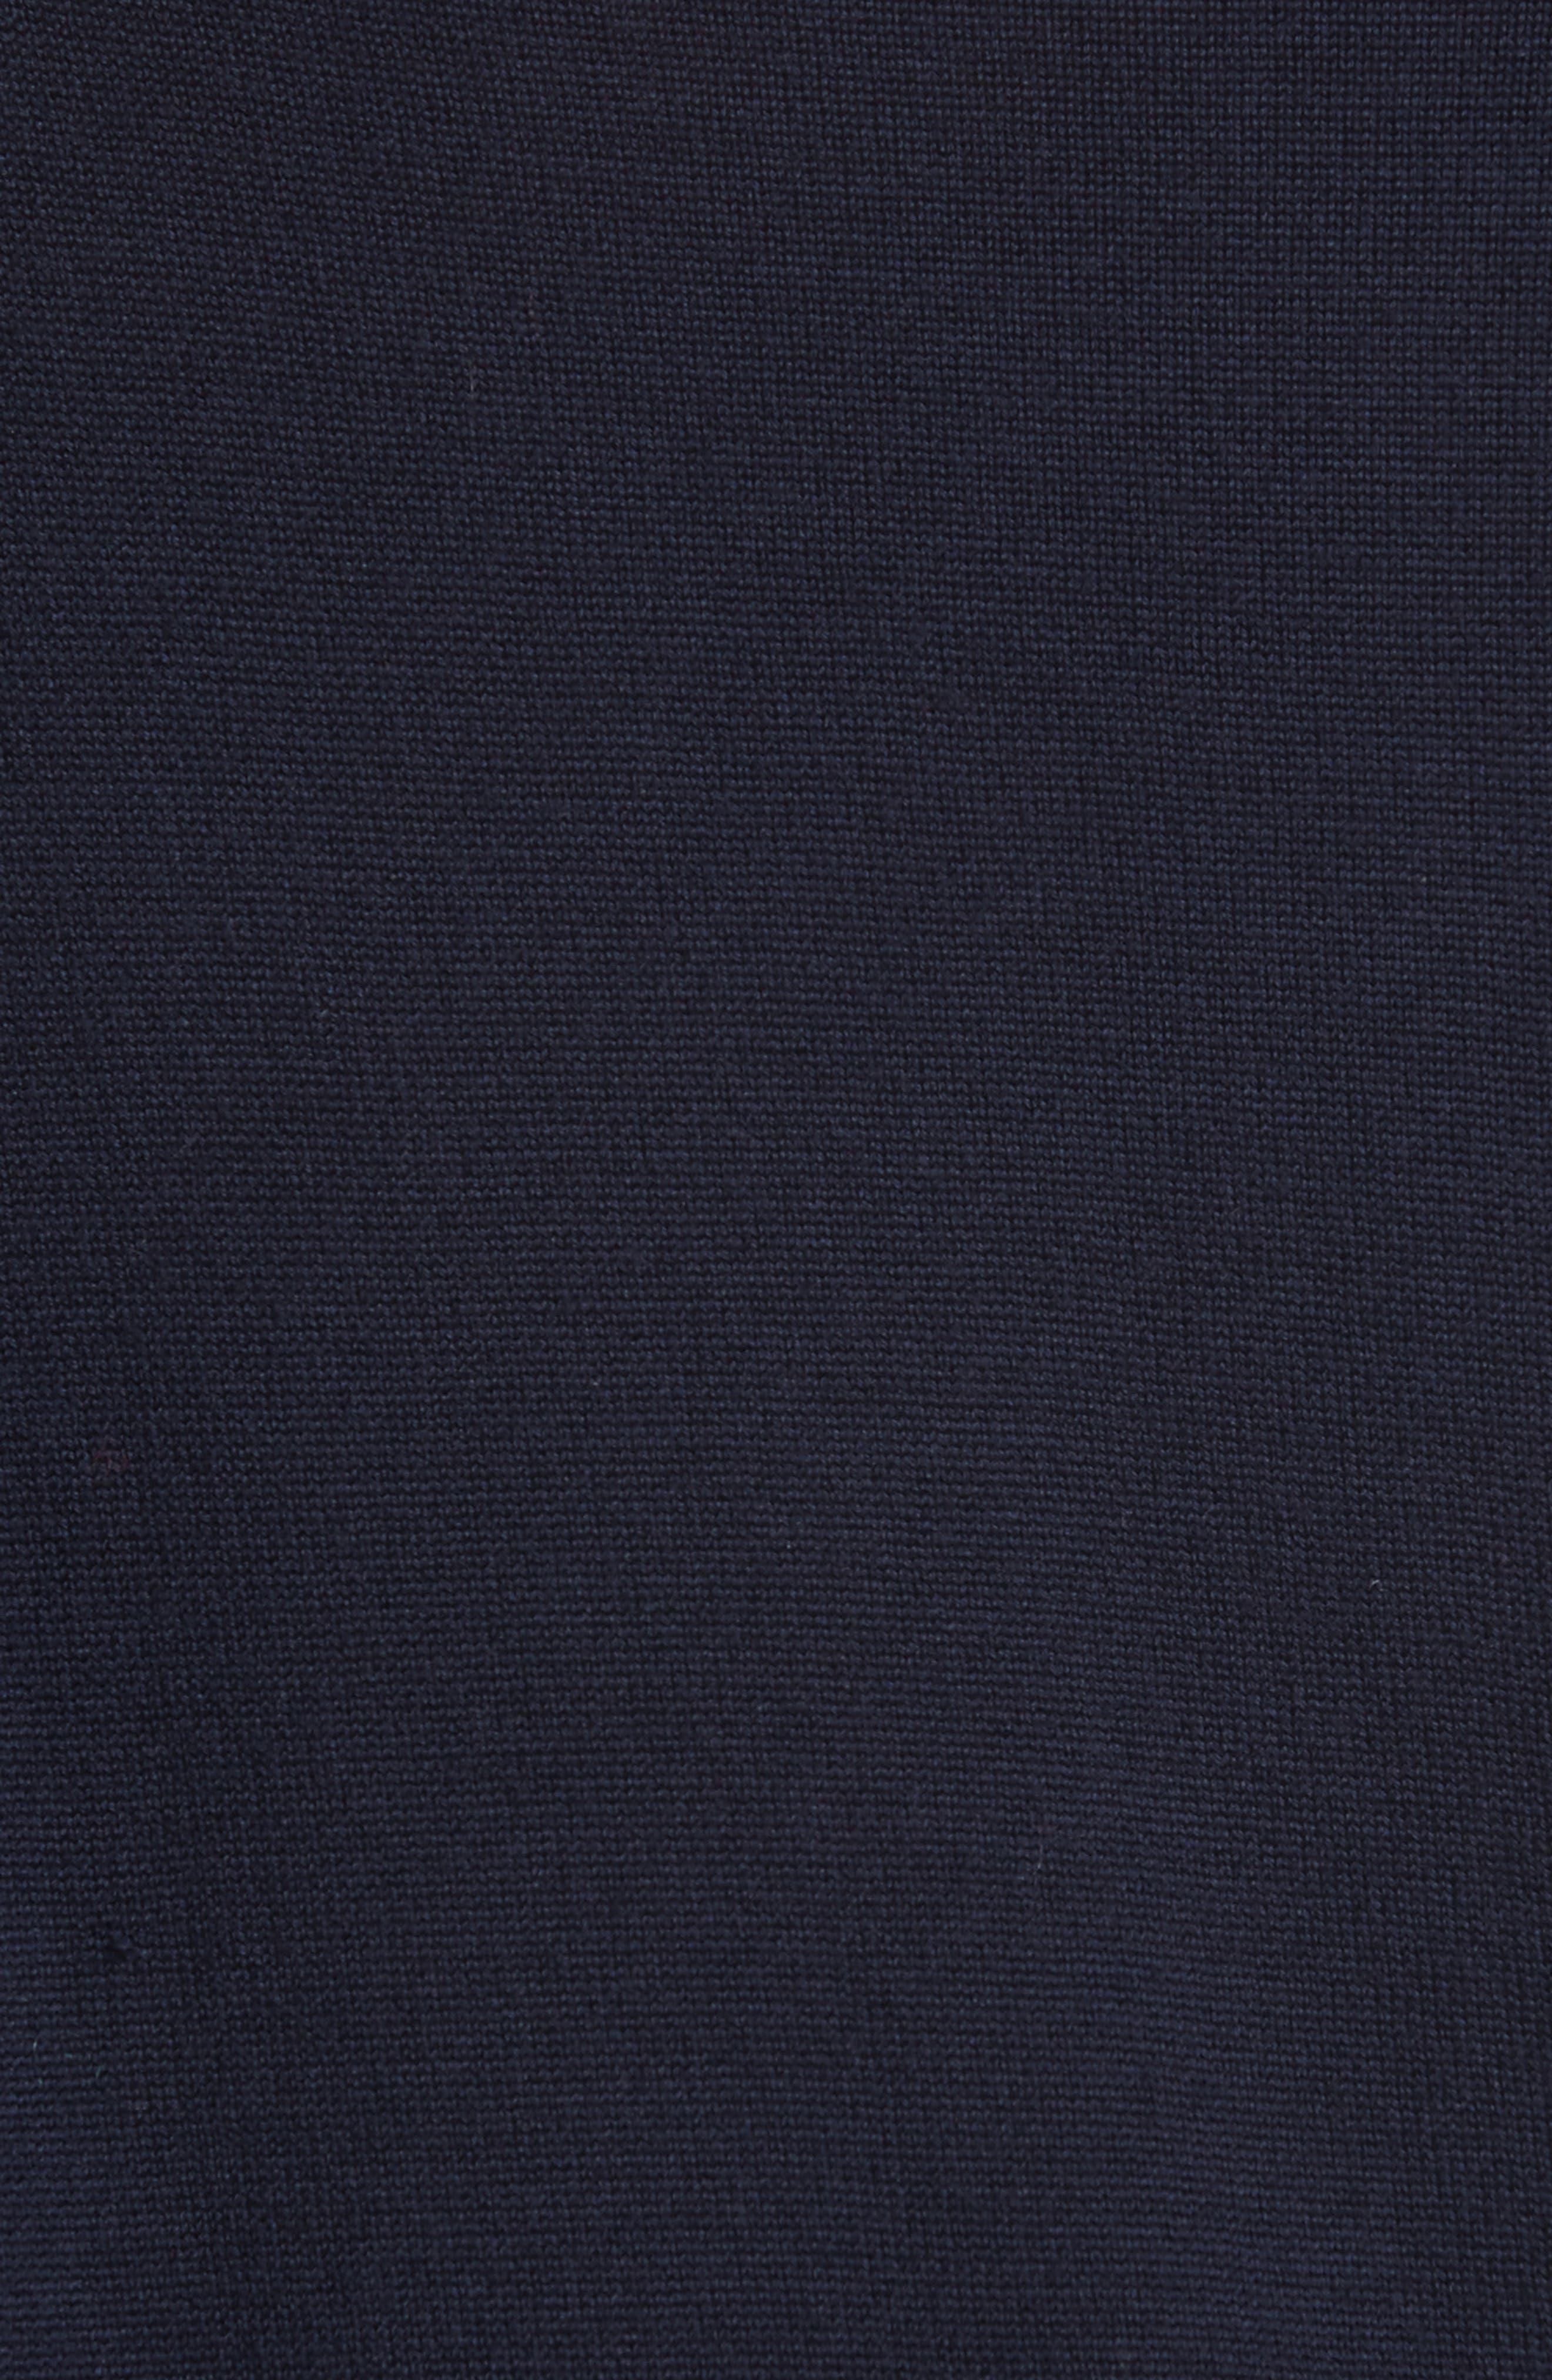 Cotton Gusset Merino Wool Sweater,                             Alternate thumbnail 5, color,